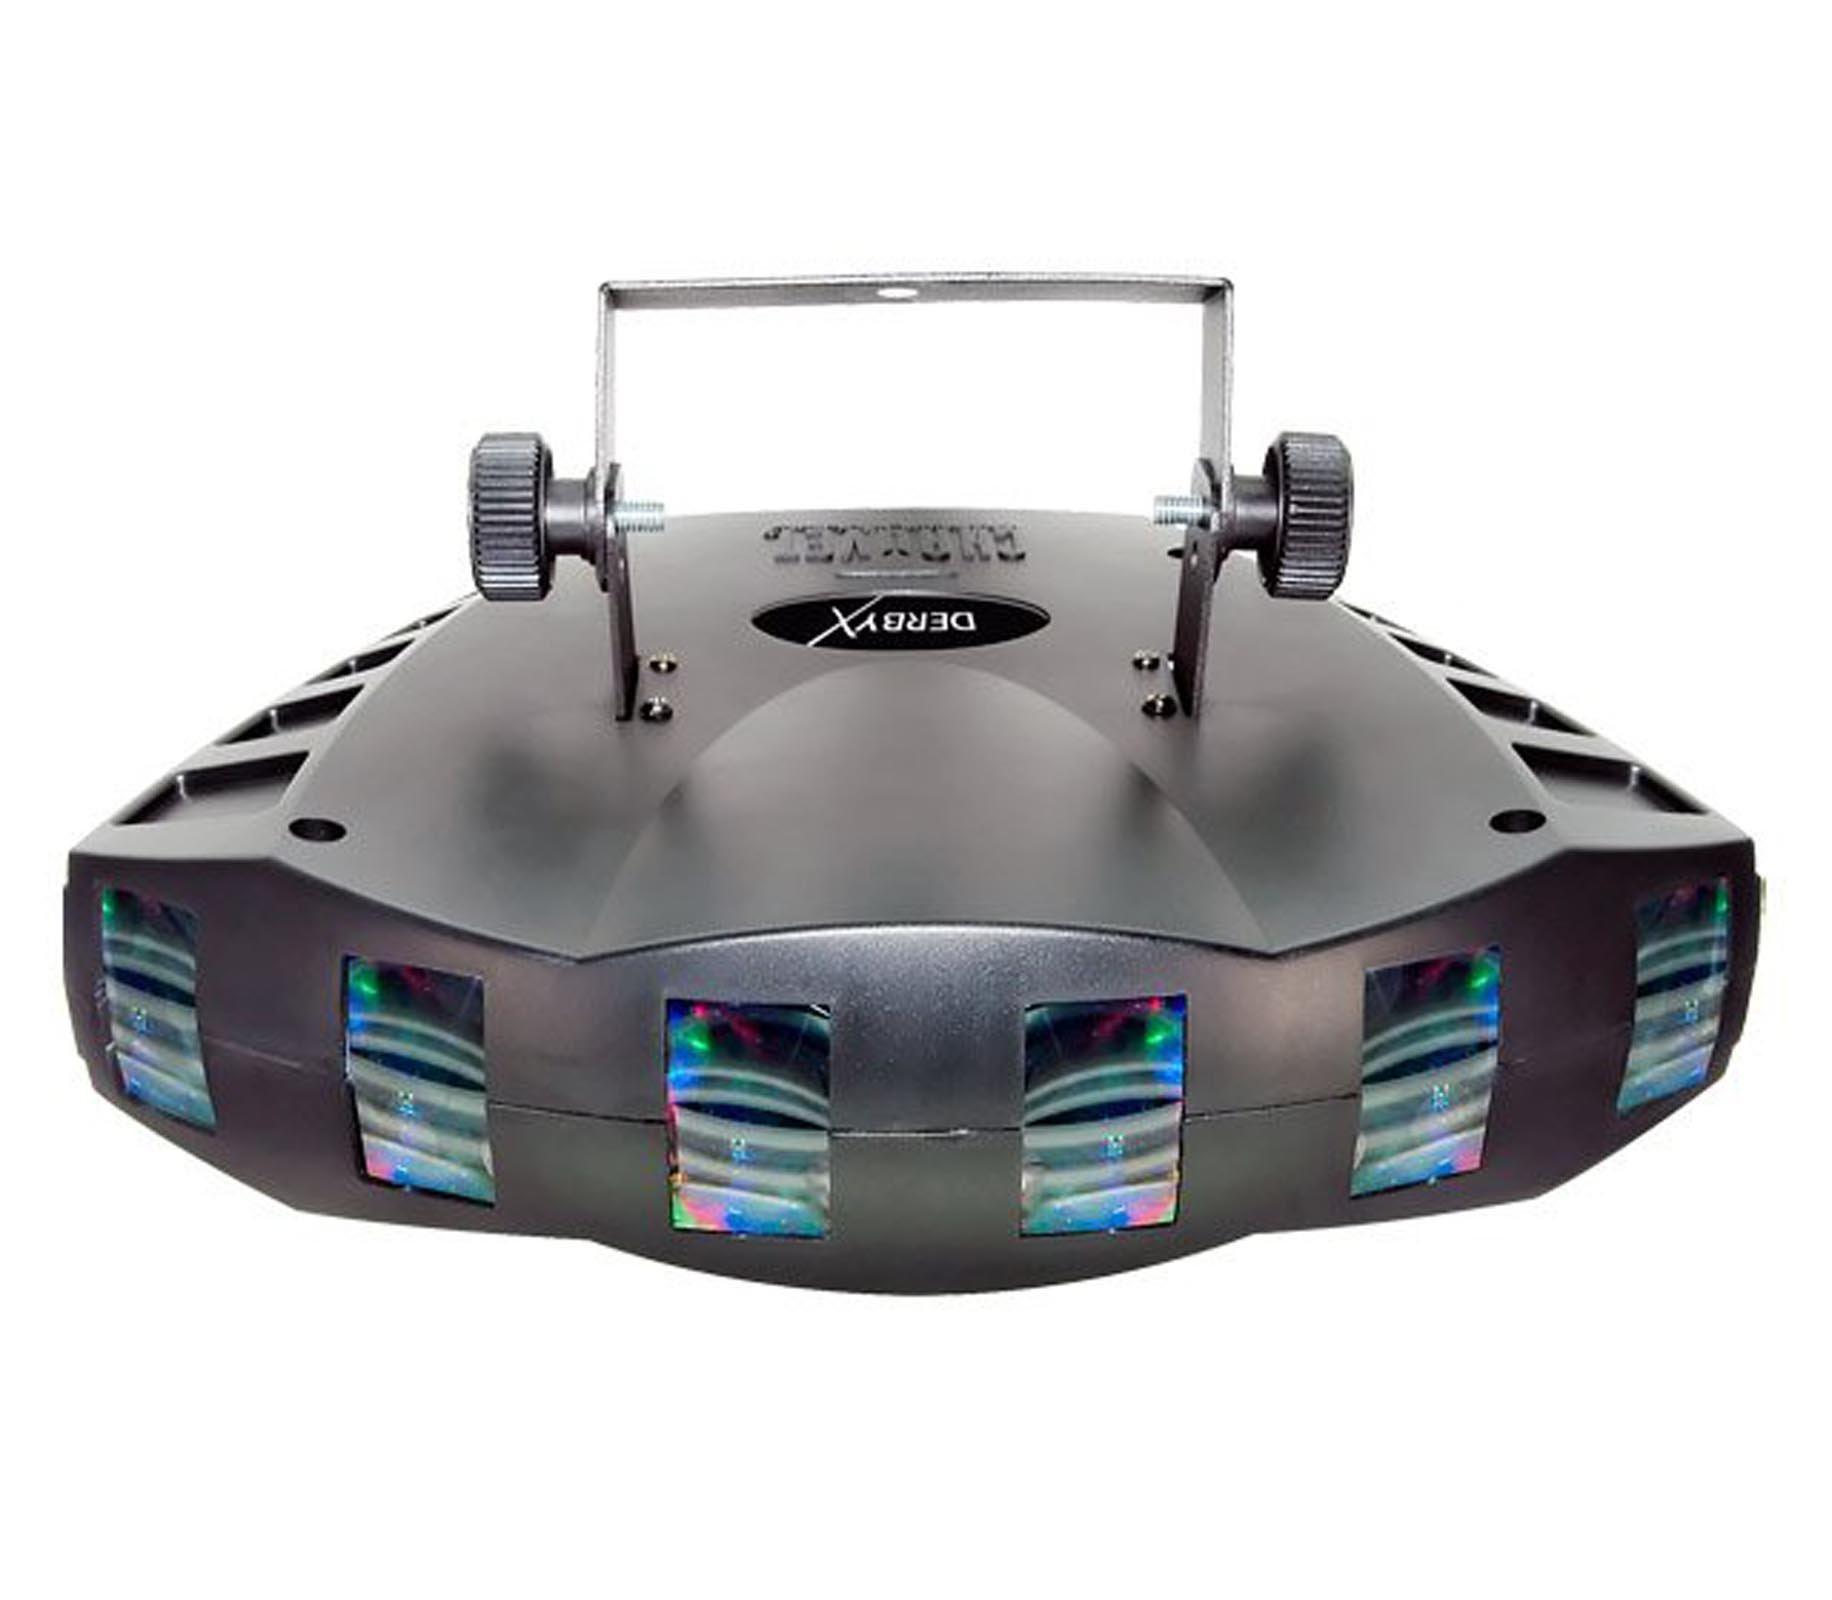 CHAUVET DERBY X RGB DMX Pro DJ Club Effect Strobe Light + BOB-LED Flame Light